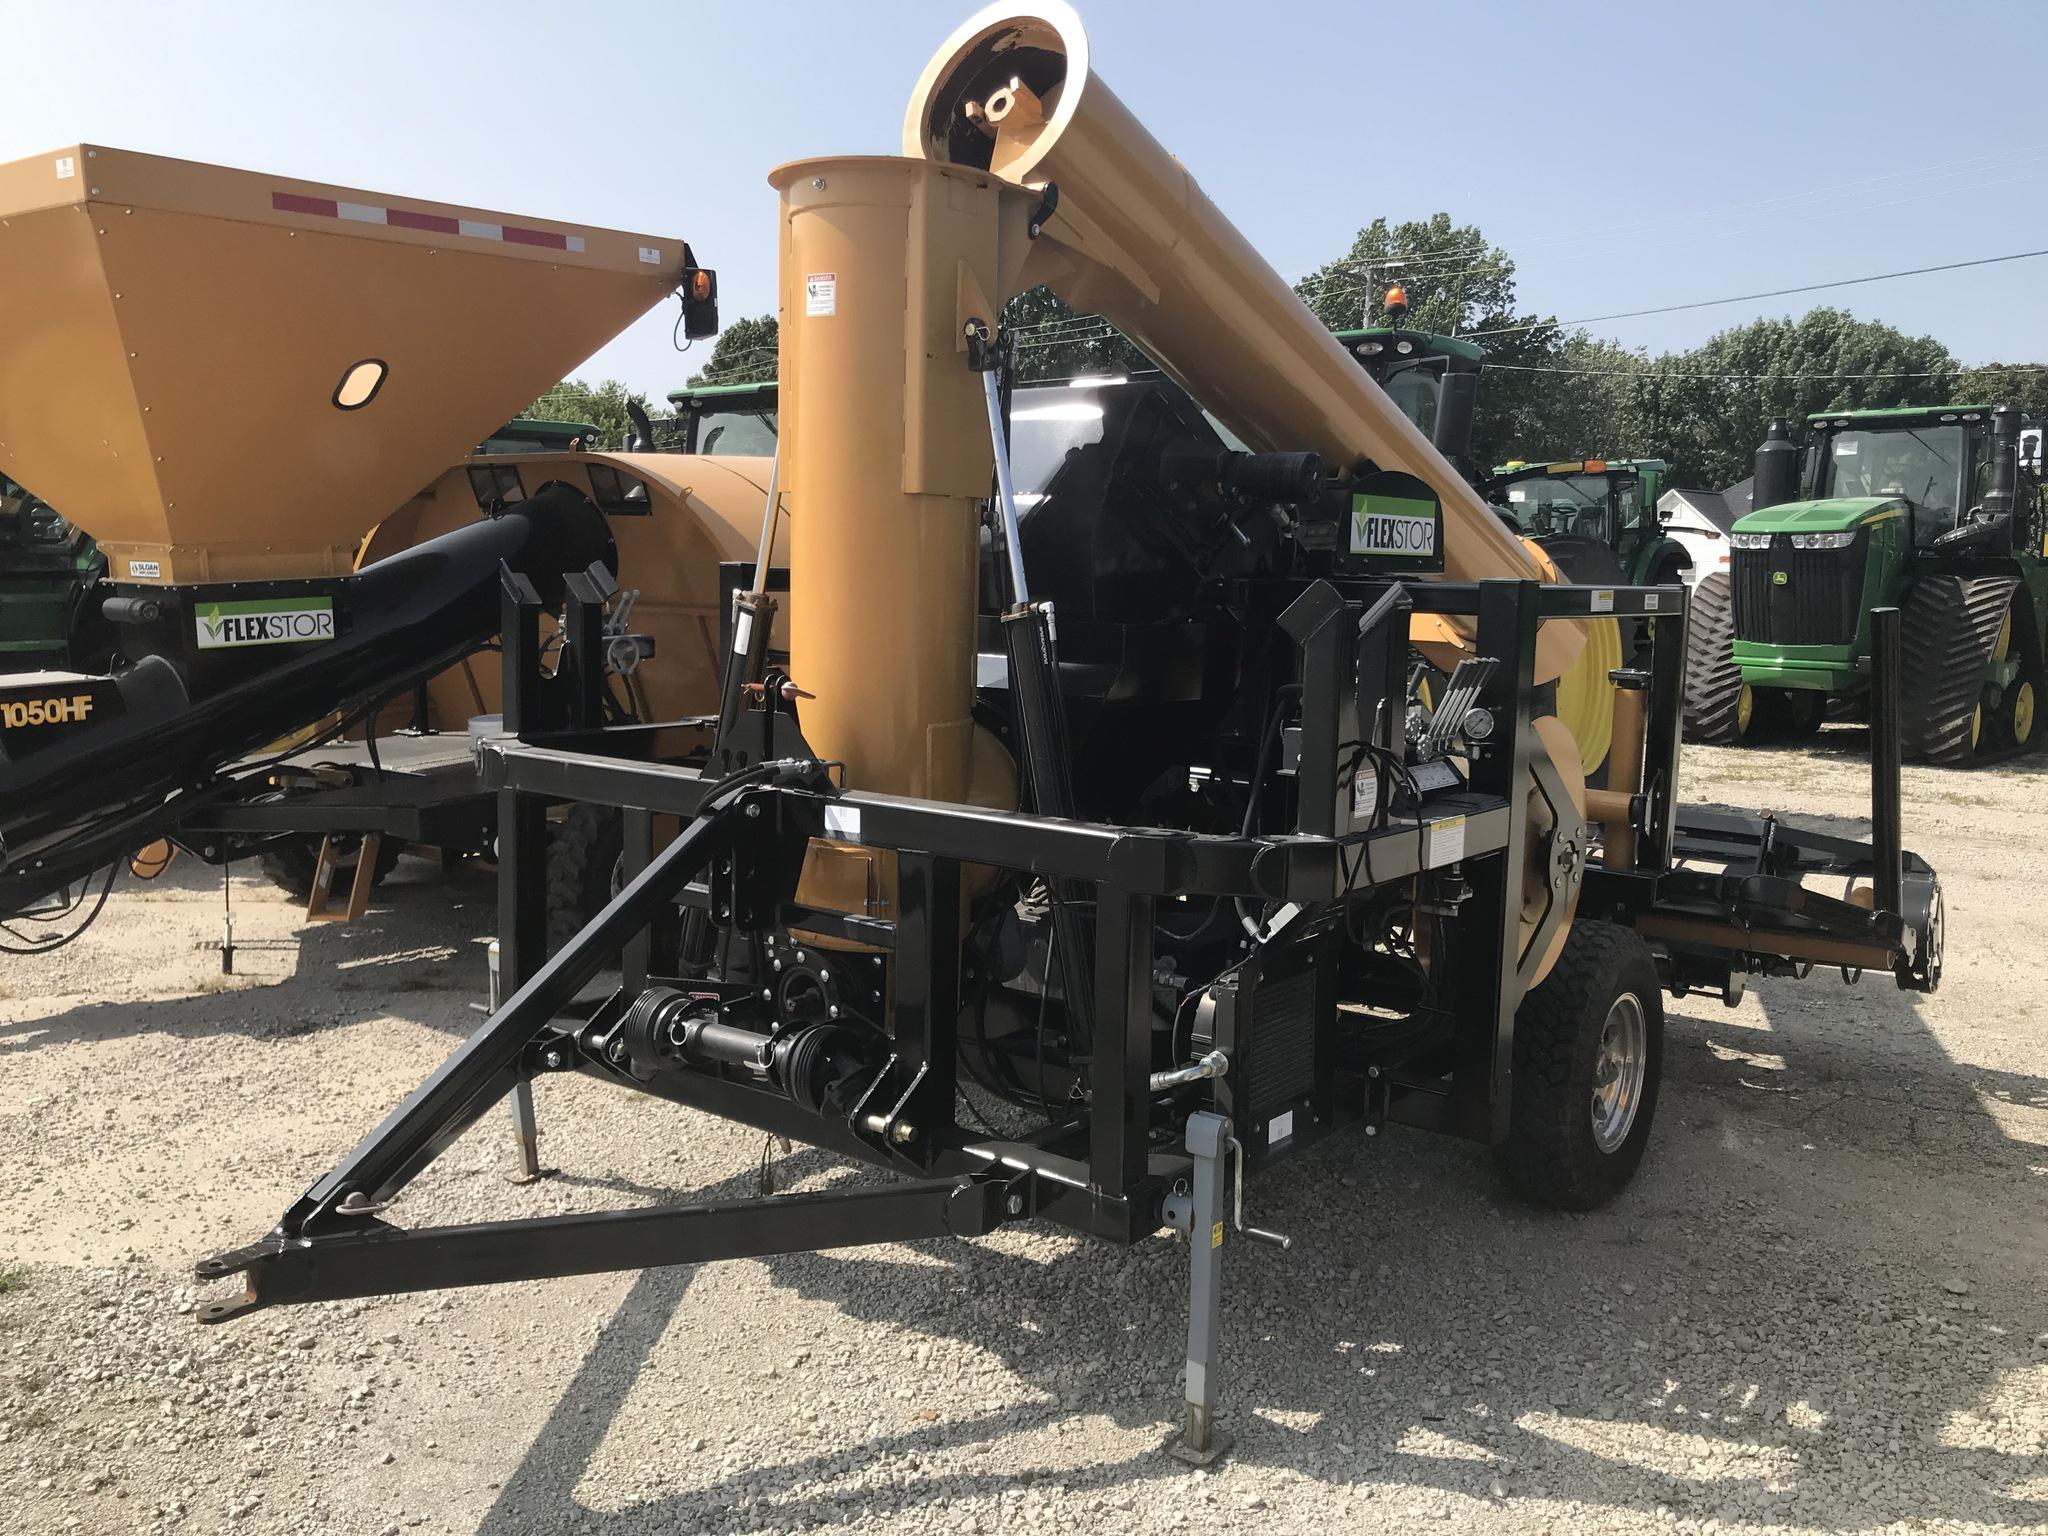 2019 Koyker 1055 Grain Bag Unloader